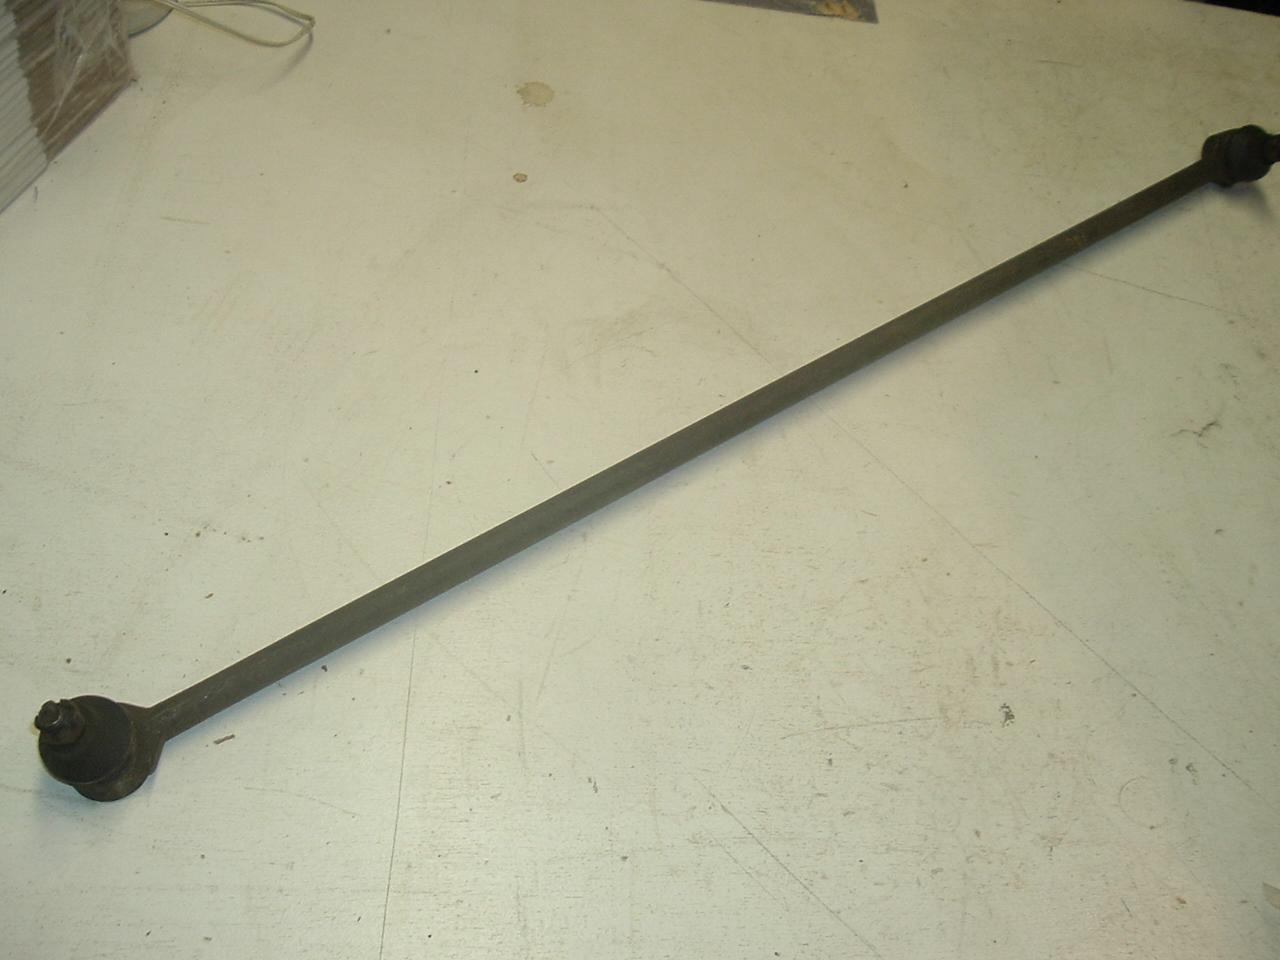 1939-48 Chevrolet complete long tie rod assembly es83a (a es83a)